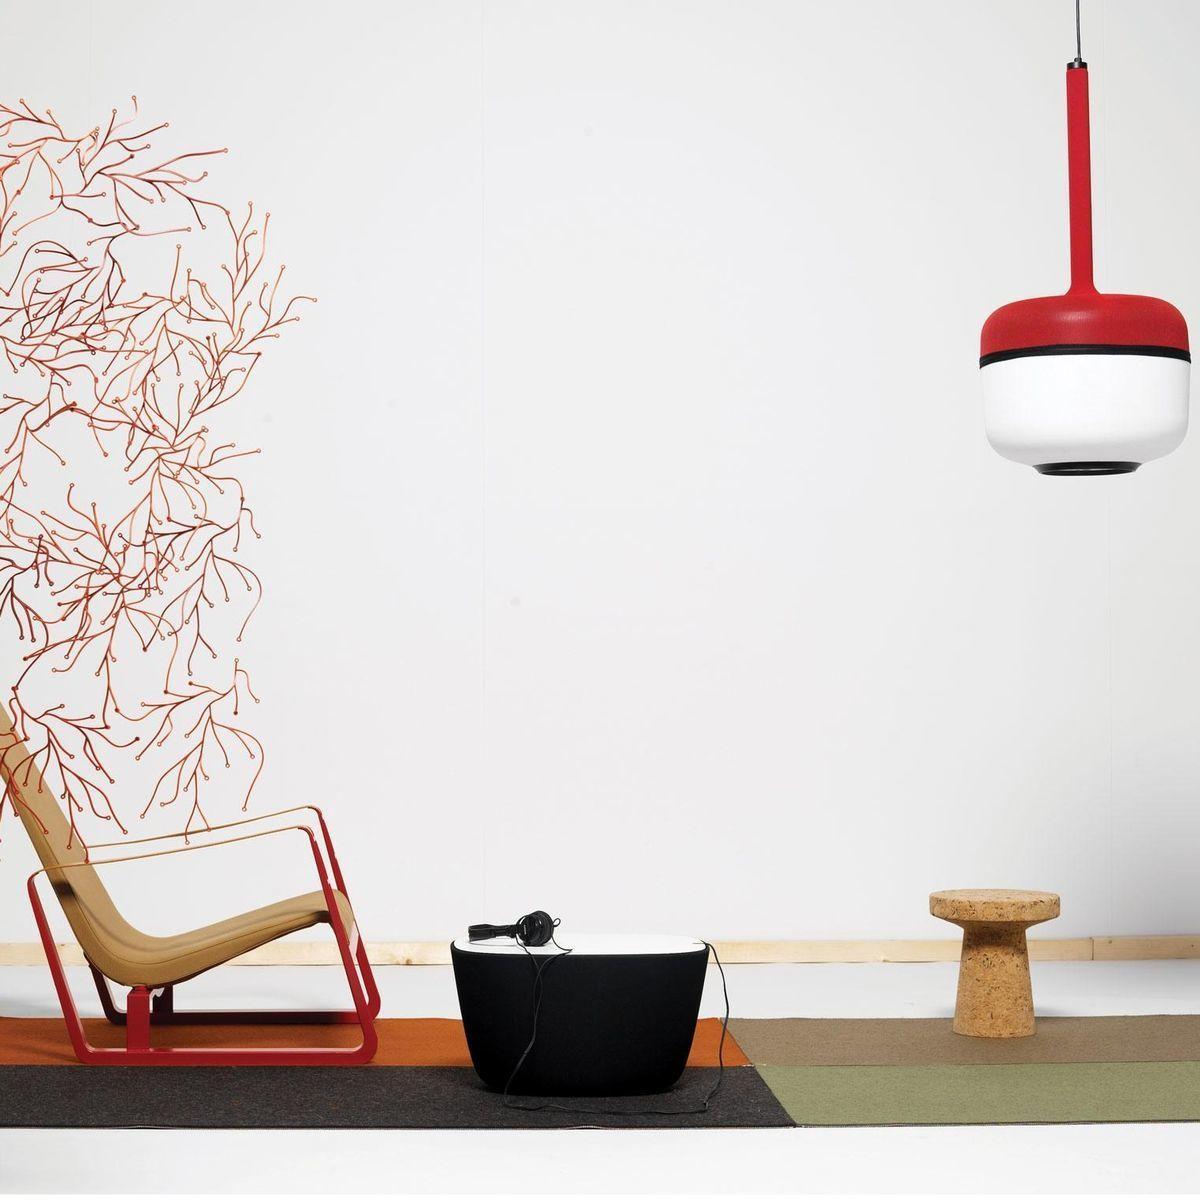 cork family beistelltisch hocker vitra. Black Bedroom Furniture Sets. Home Design Ideas